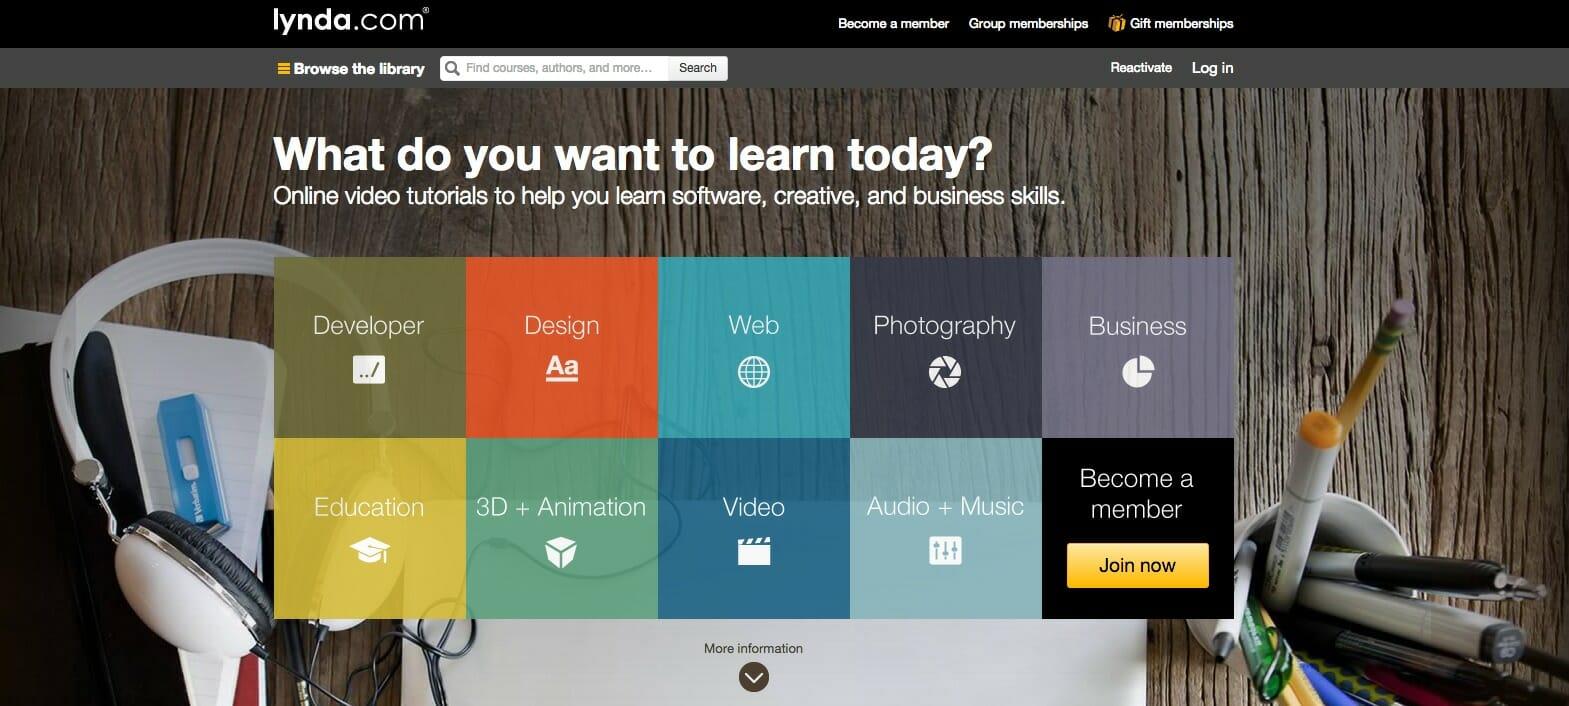 lynda.com website with various video tutorials